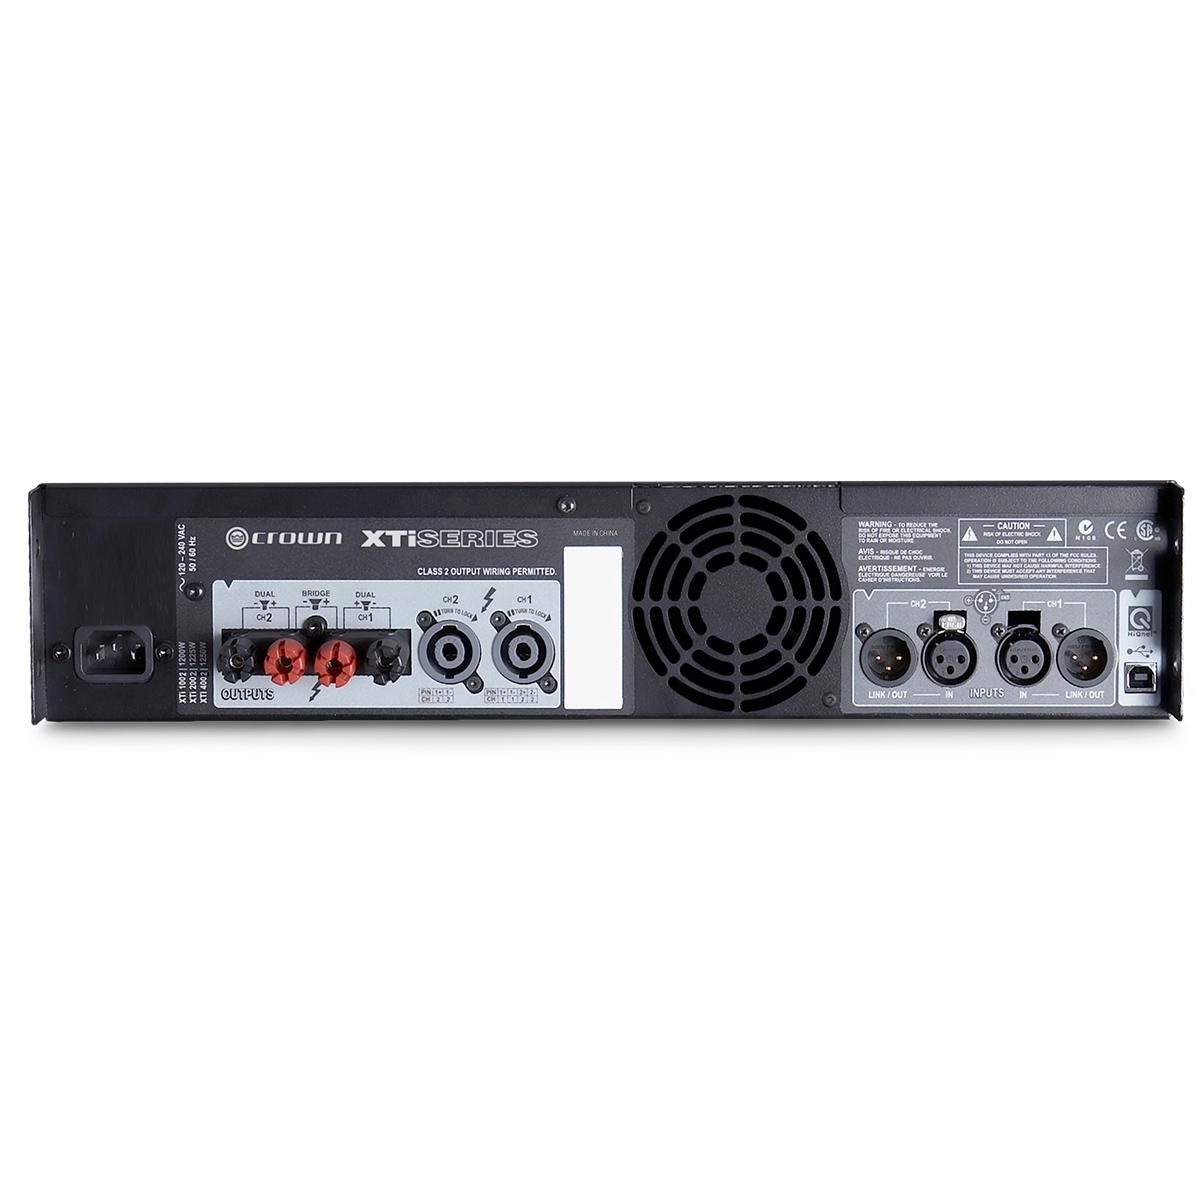 Amplificador de potência de dois canais CROWN XTI4002